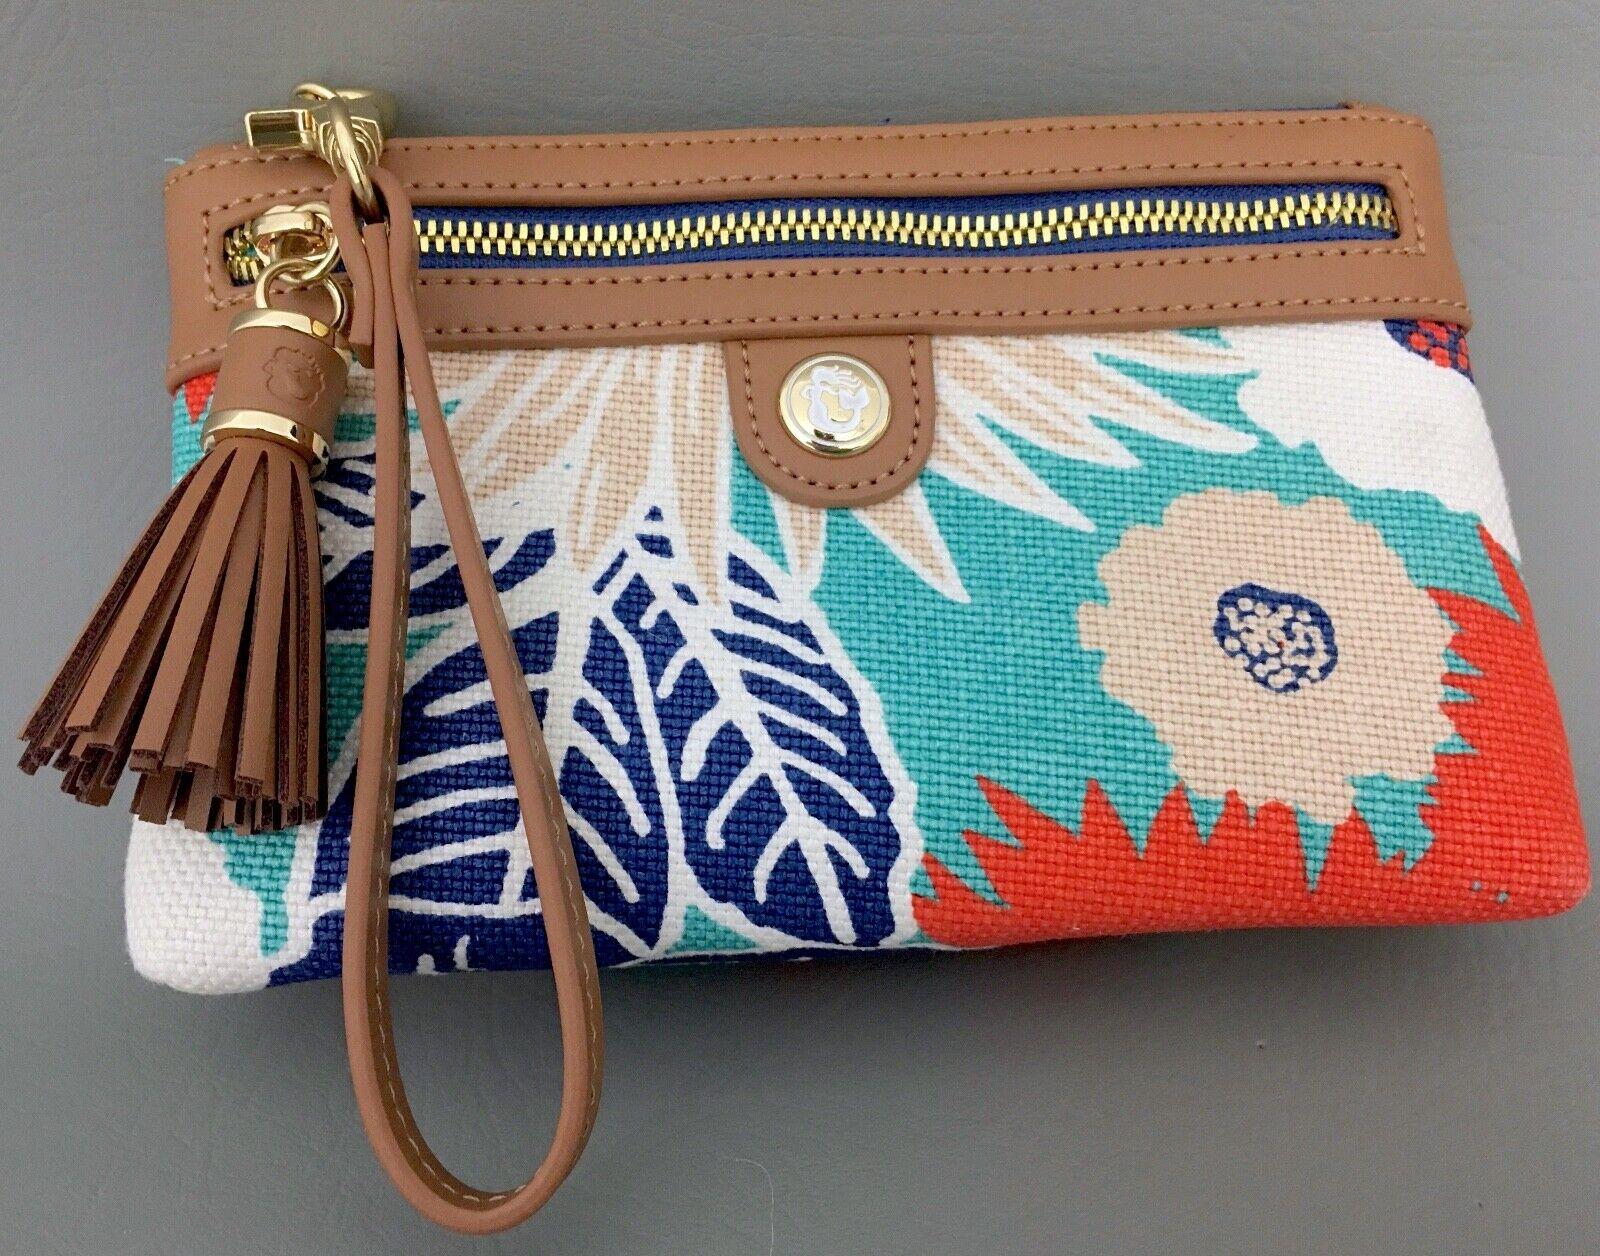 SPARTINA Multicolor Floral Print Canvas-Brown Leather Trim Wristlet, Clucth-EUC!